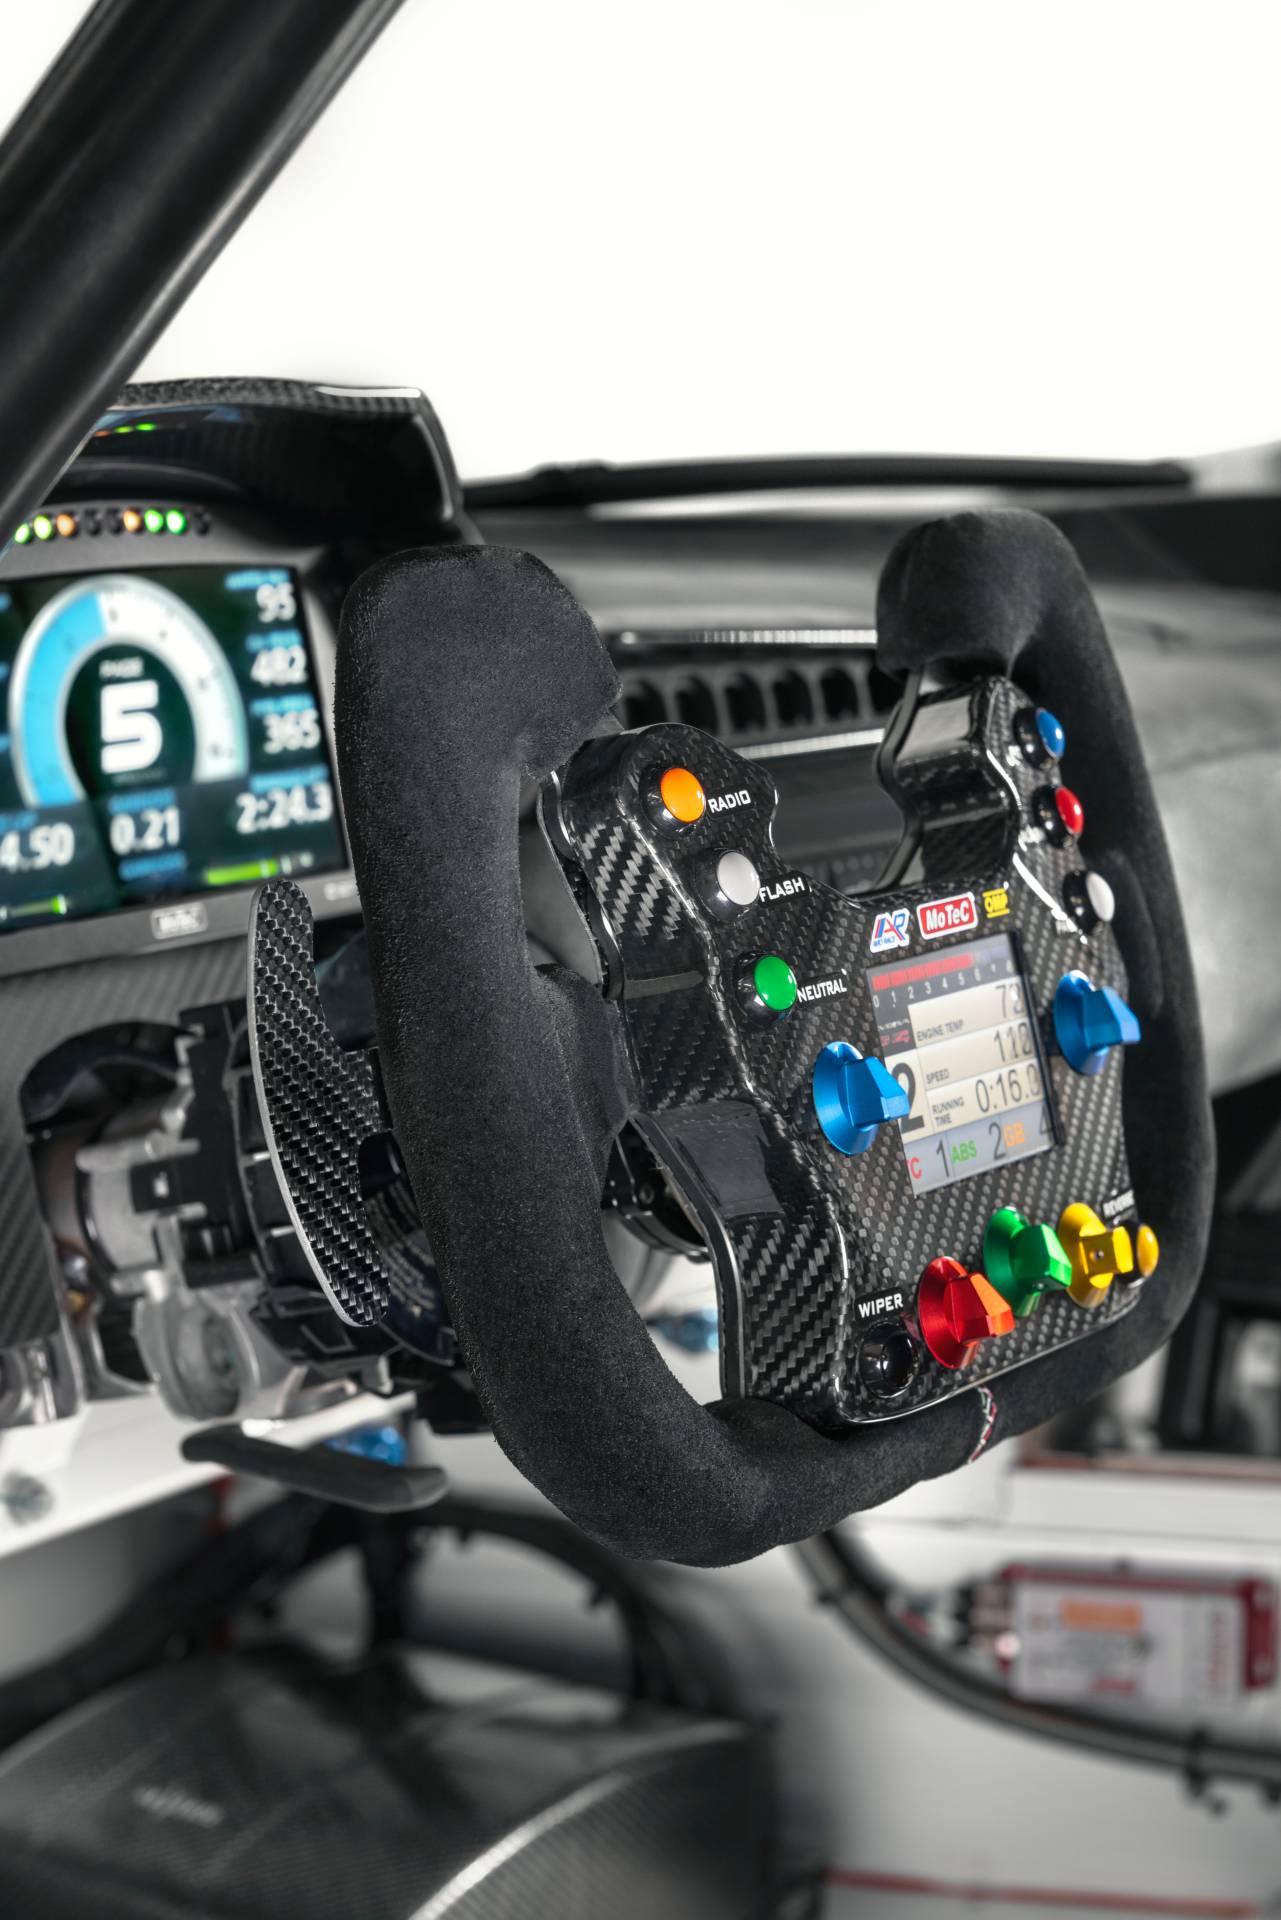 Lotus-Evora-GT4-Concept-32